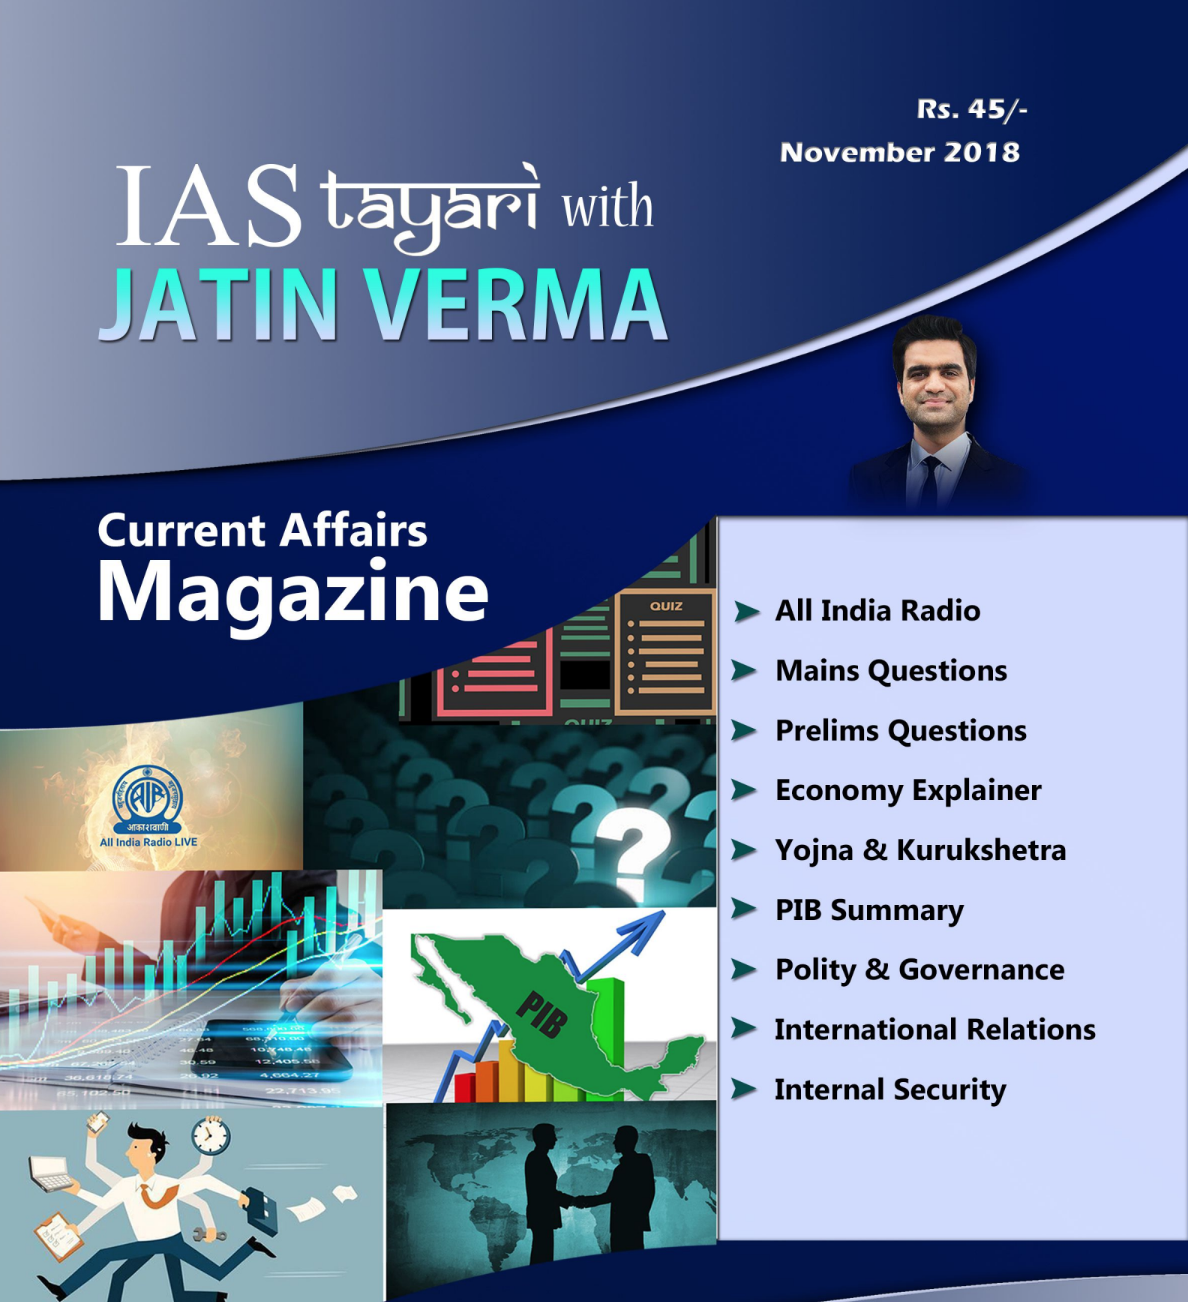 November 2018 Current Affairs Magazine [Hard Copy] - Jatin Verma